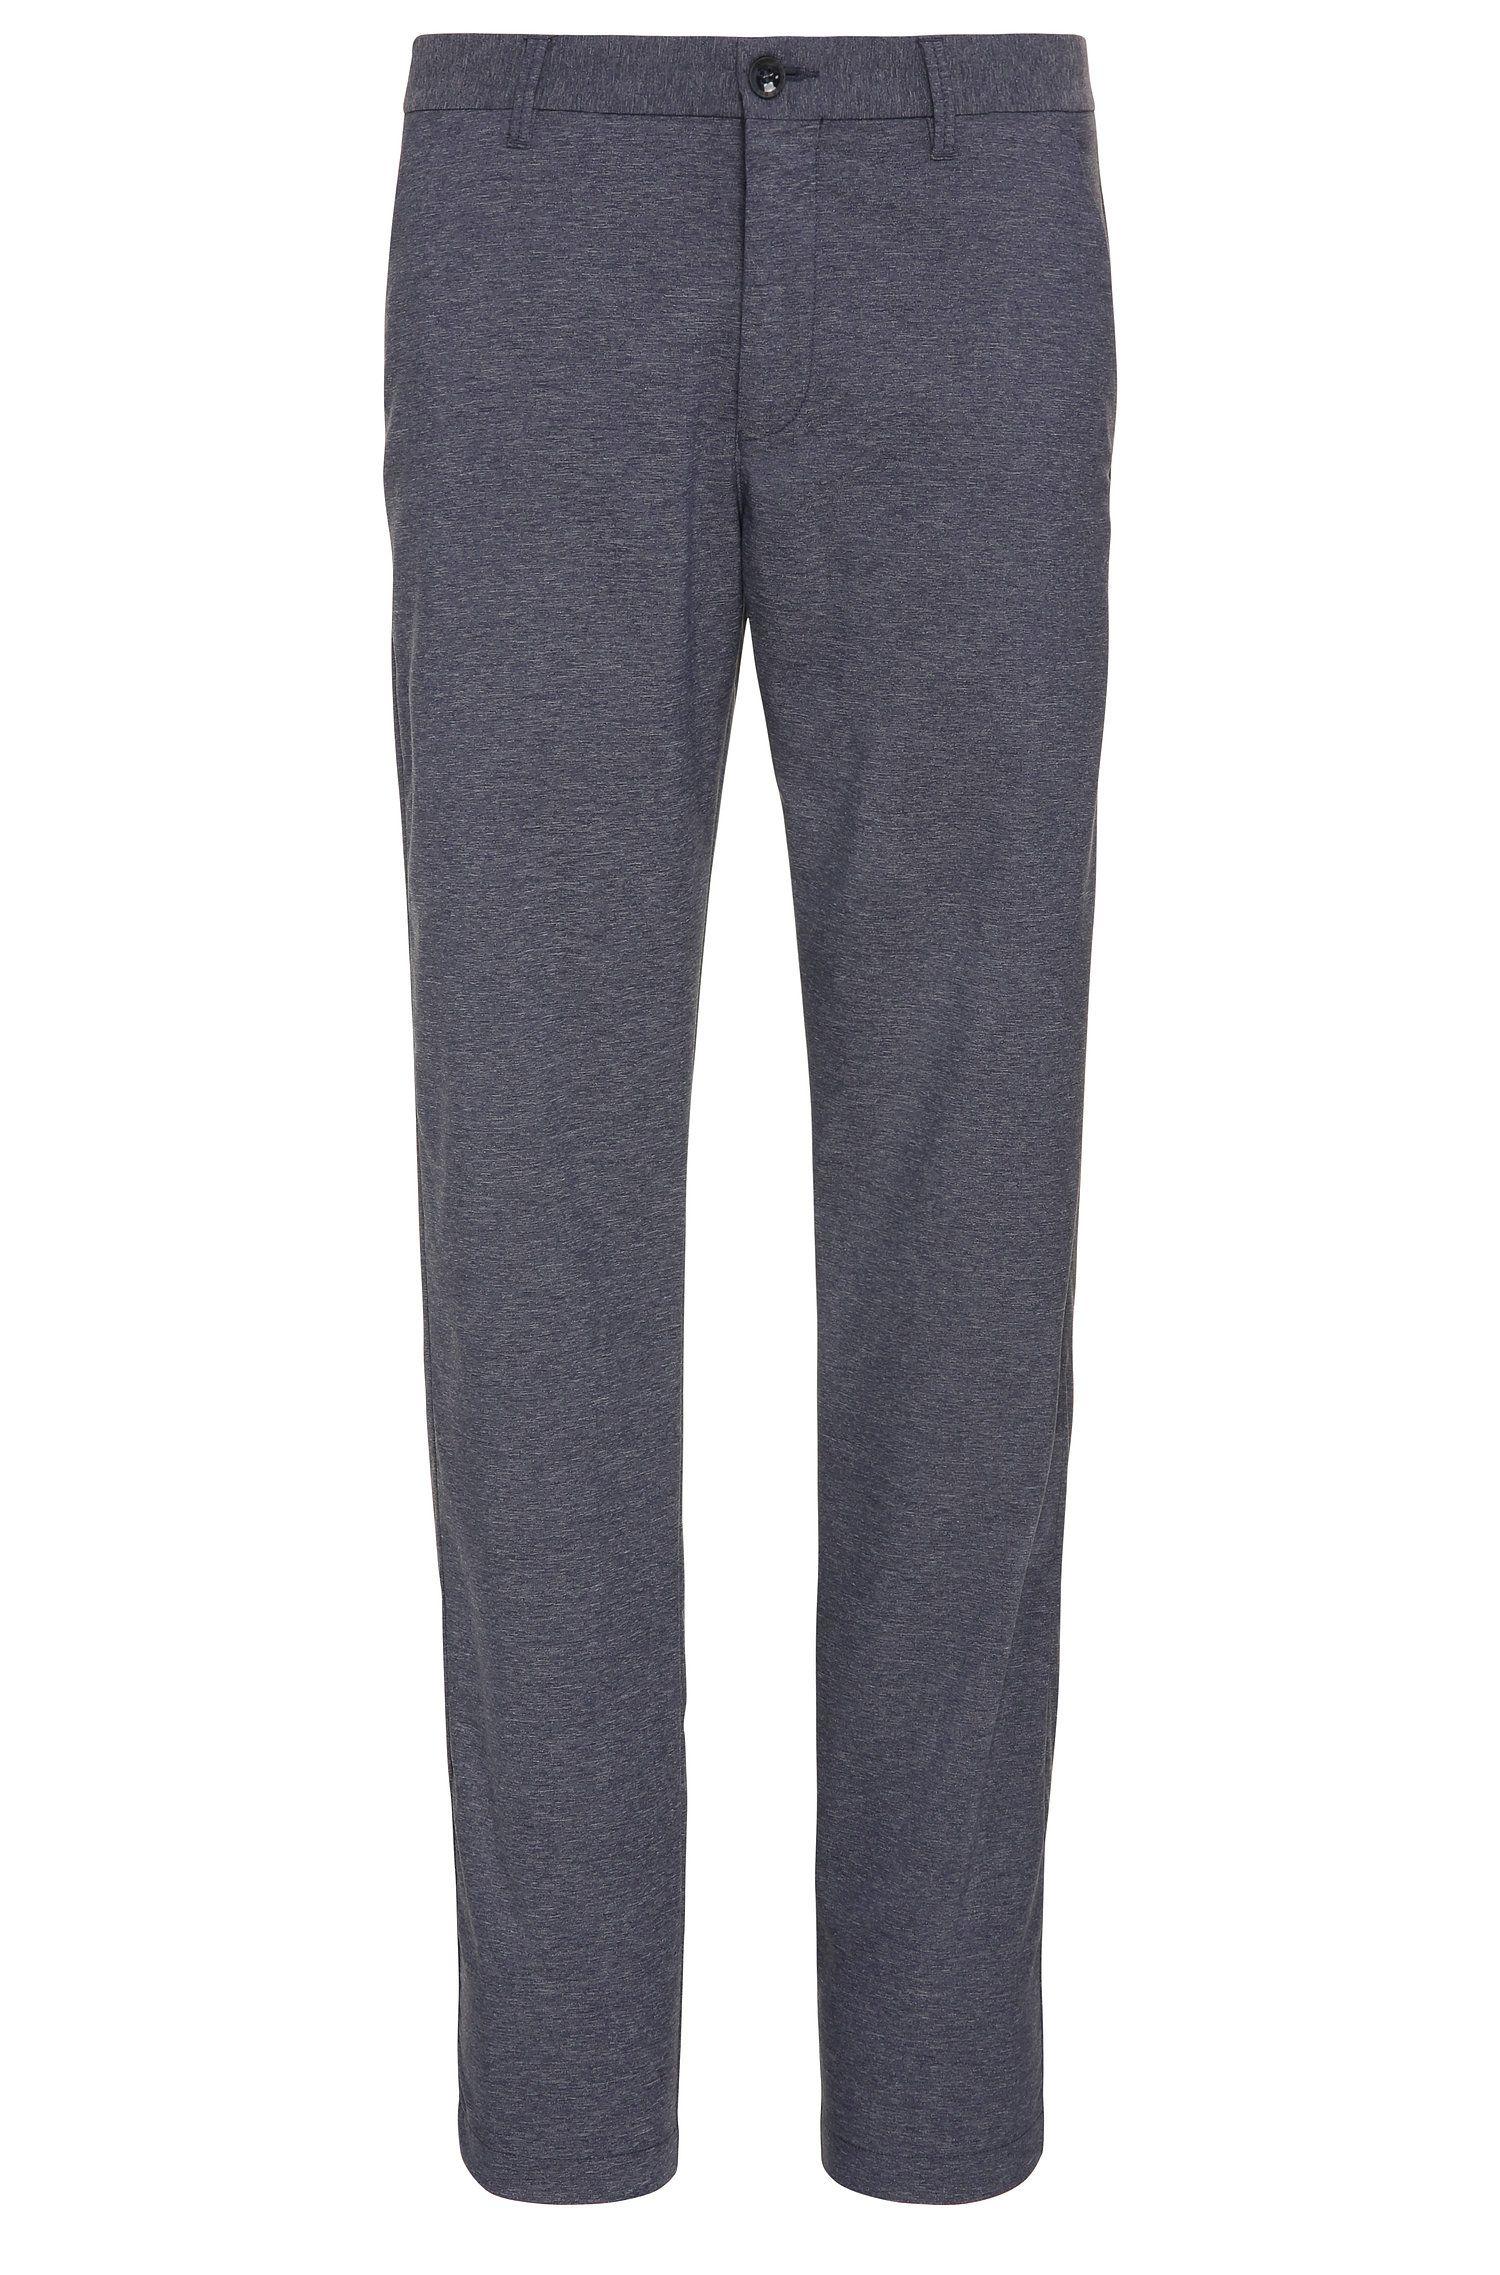 CoolMax Performance Golf Pants, Slim Fit | Hakan Slim